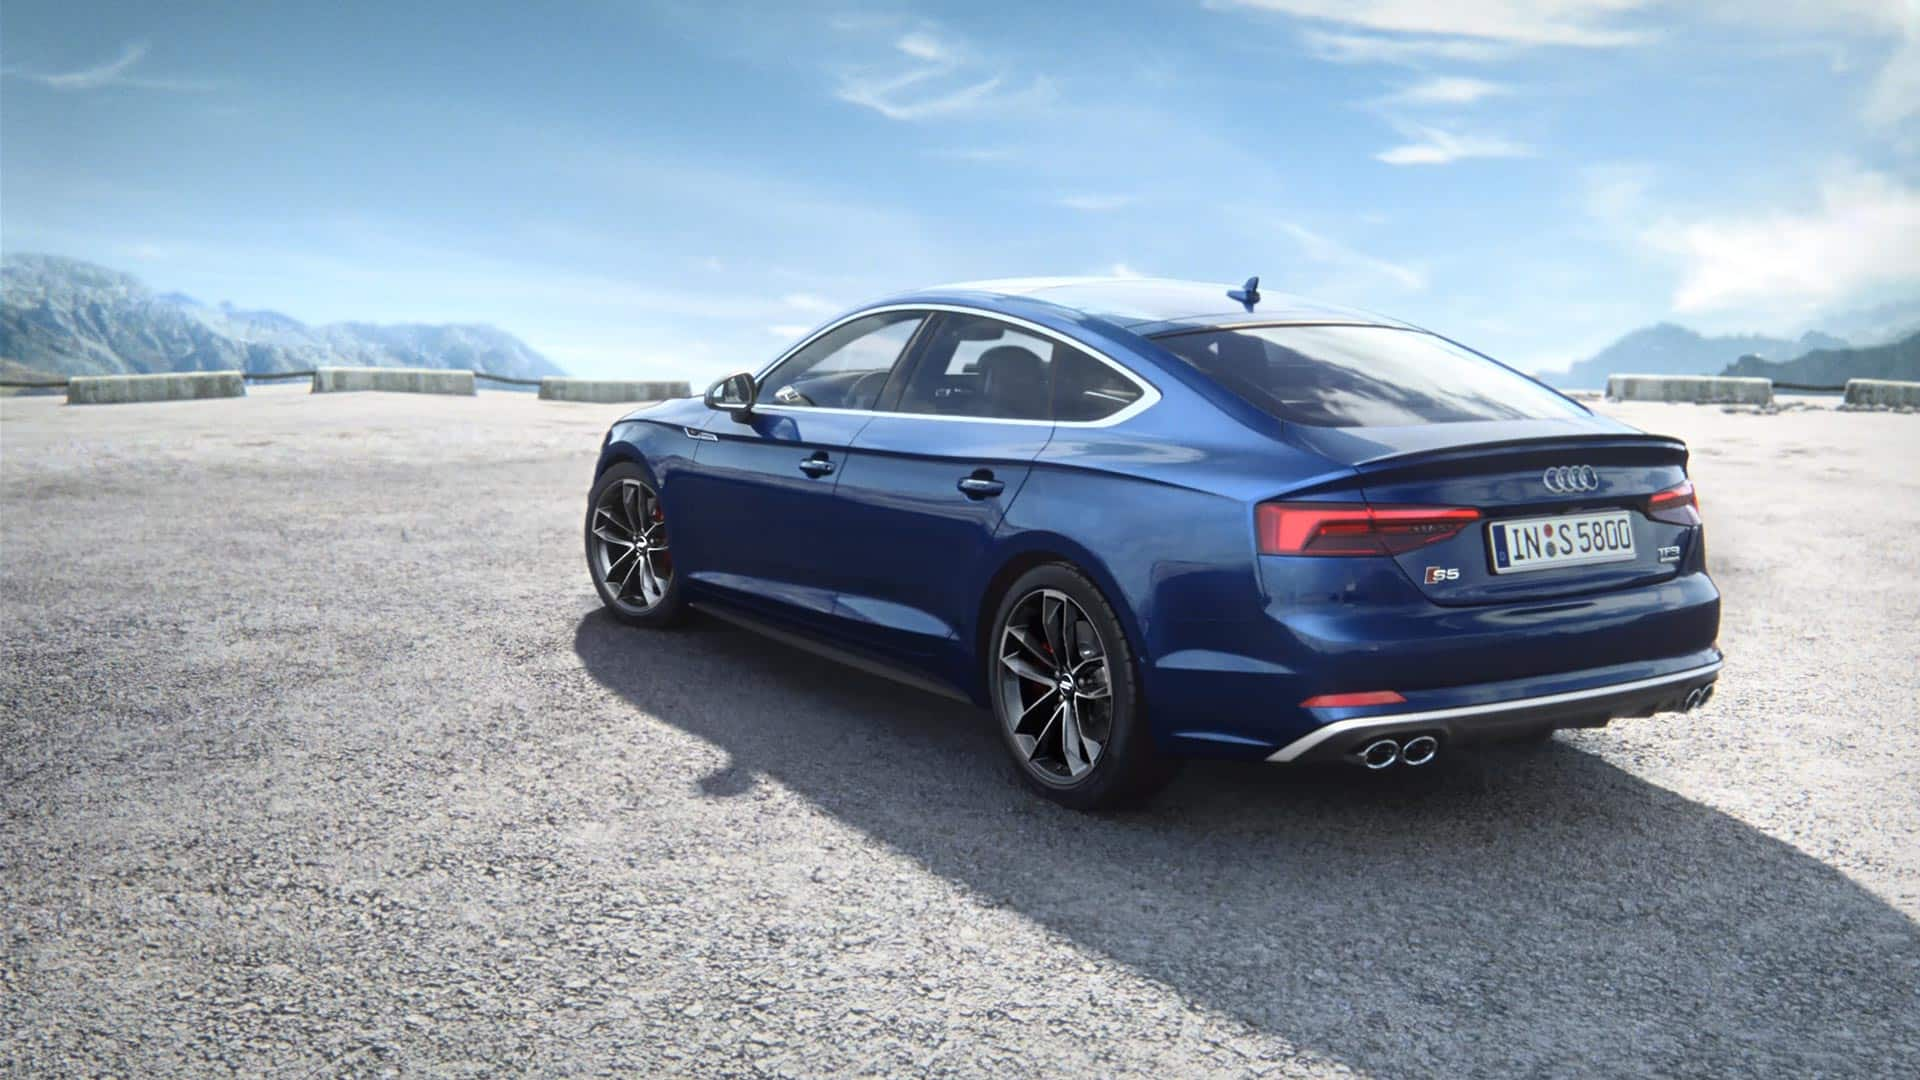 S5 Sportback Gt Audi Deutschland